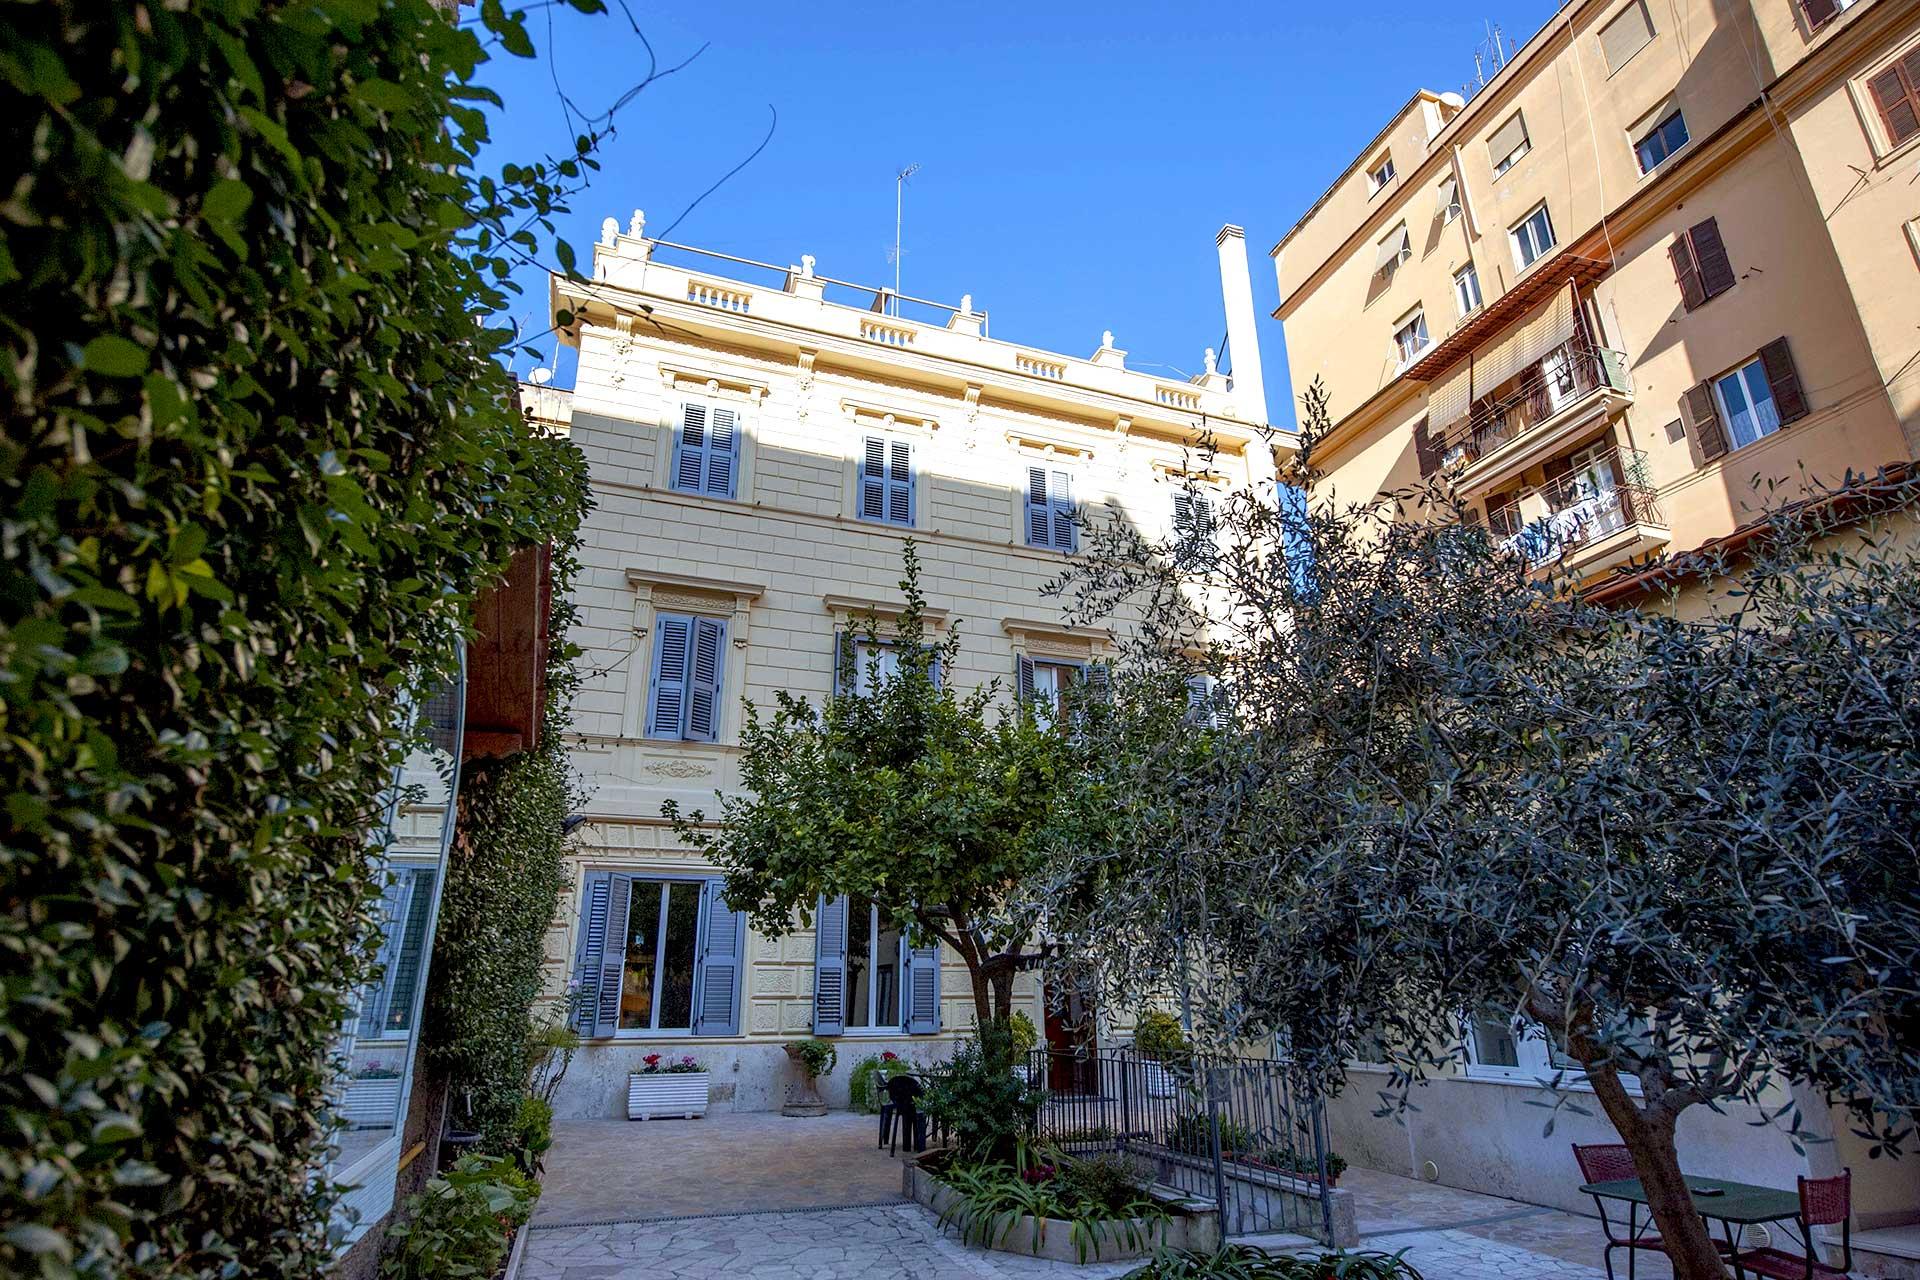 noel 2018 ferie Italiano) Home   Casa per ferie Villino Noel   Dormire a Roma  noel 2018 ferie